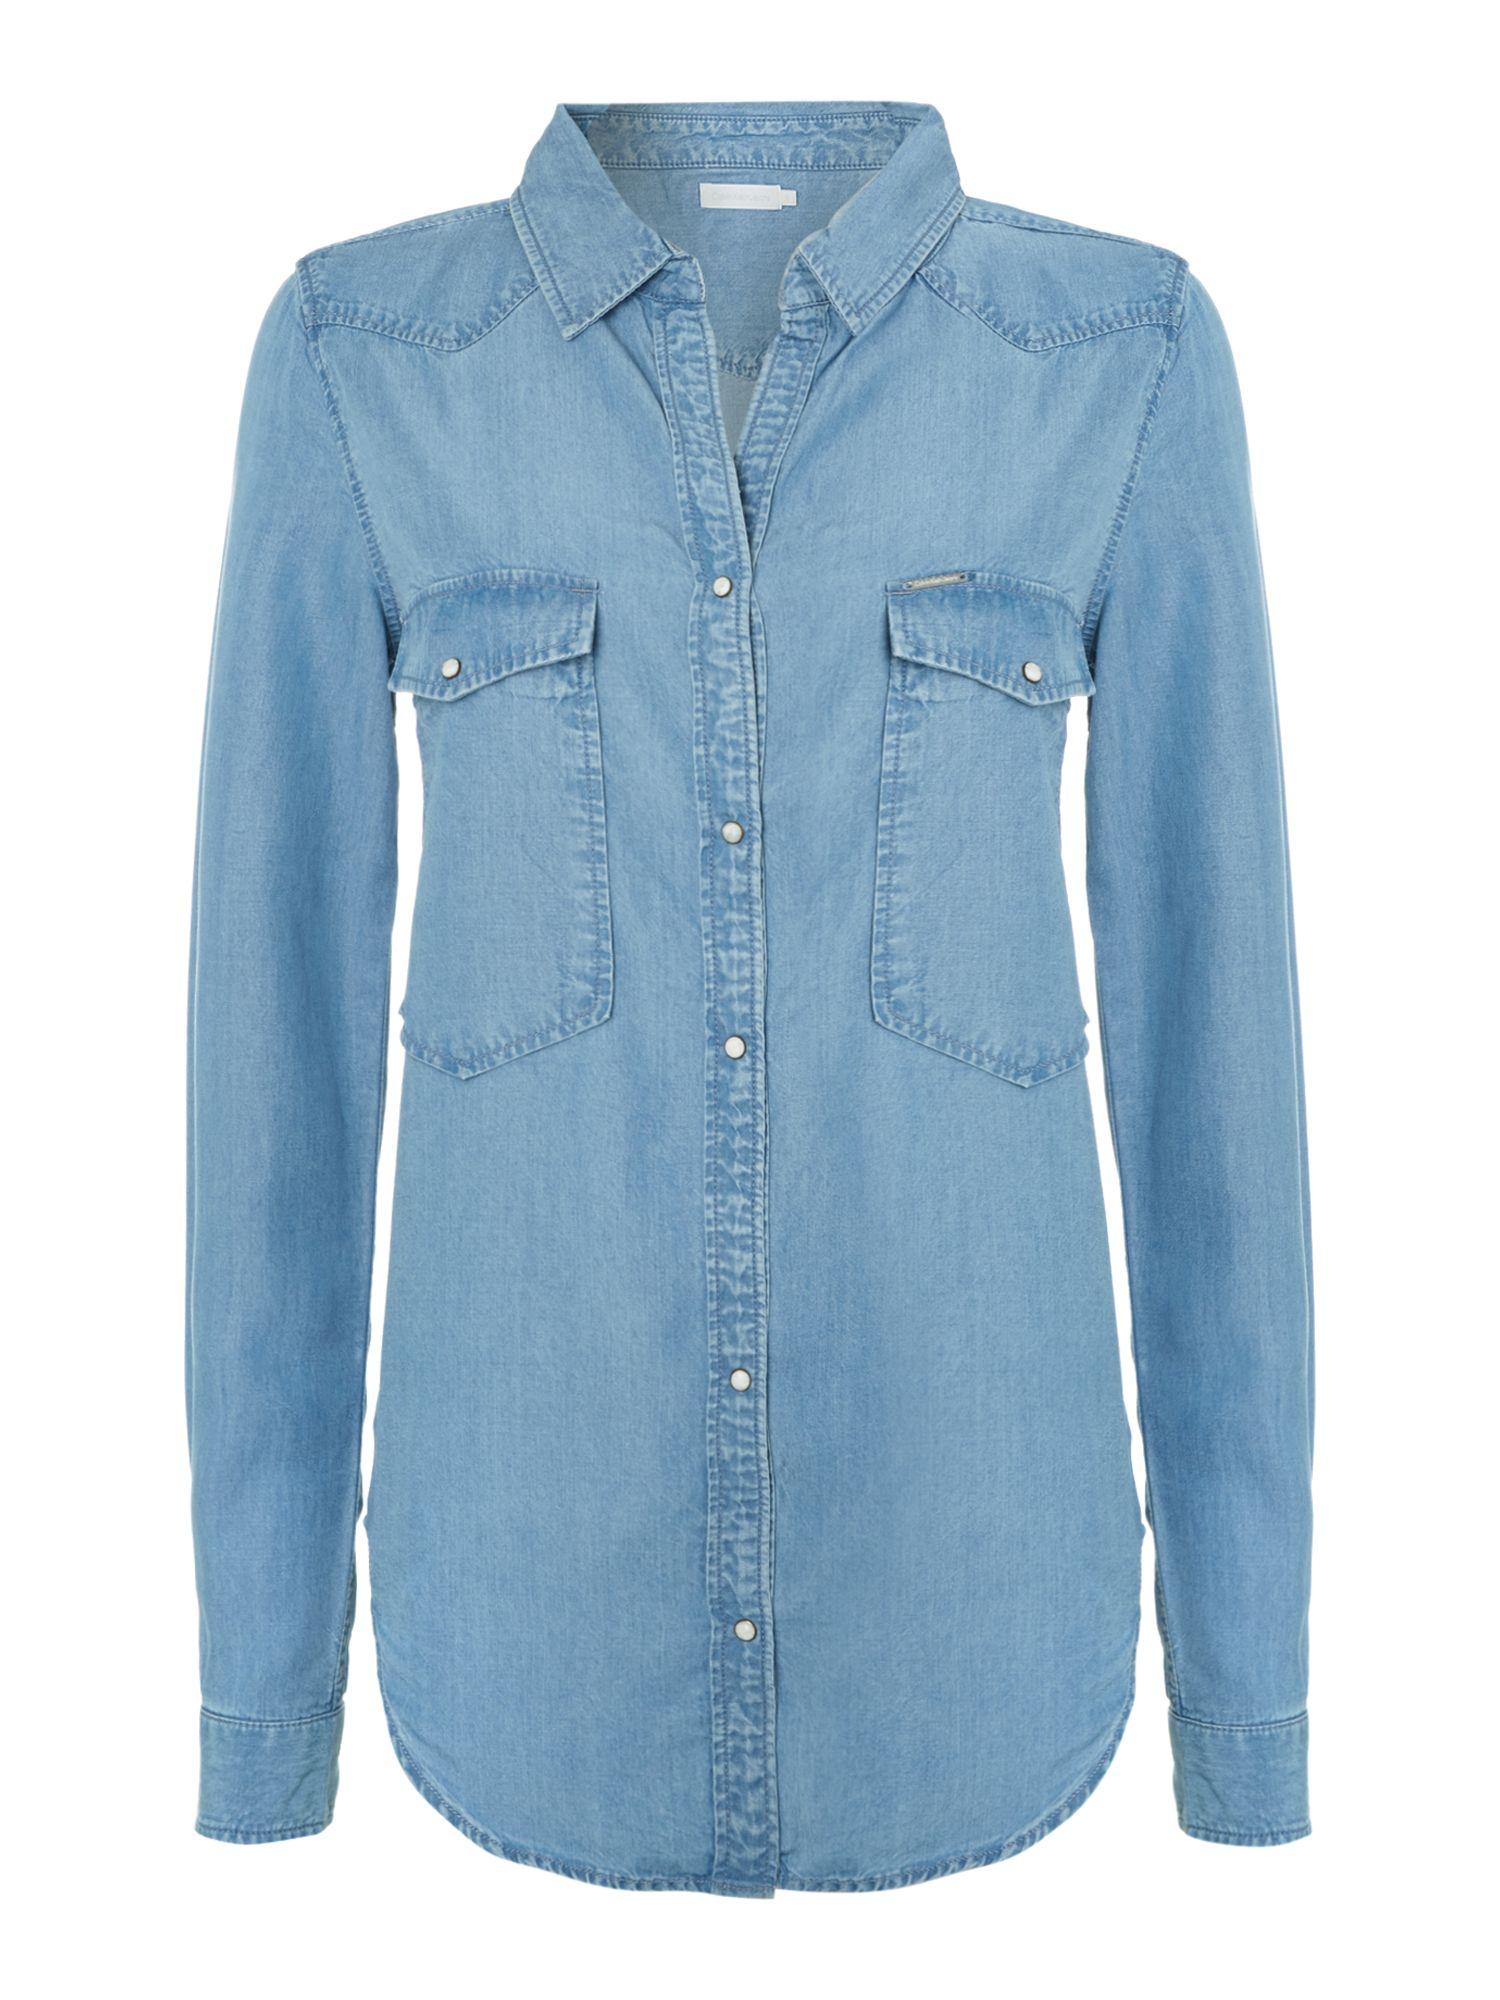 calvin klein whisper long sleeve denim shirt in blue lyst. Black Bedroom Furniture Sets. Home Design Ideas